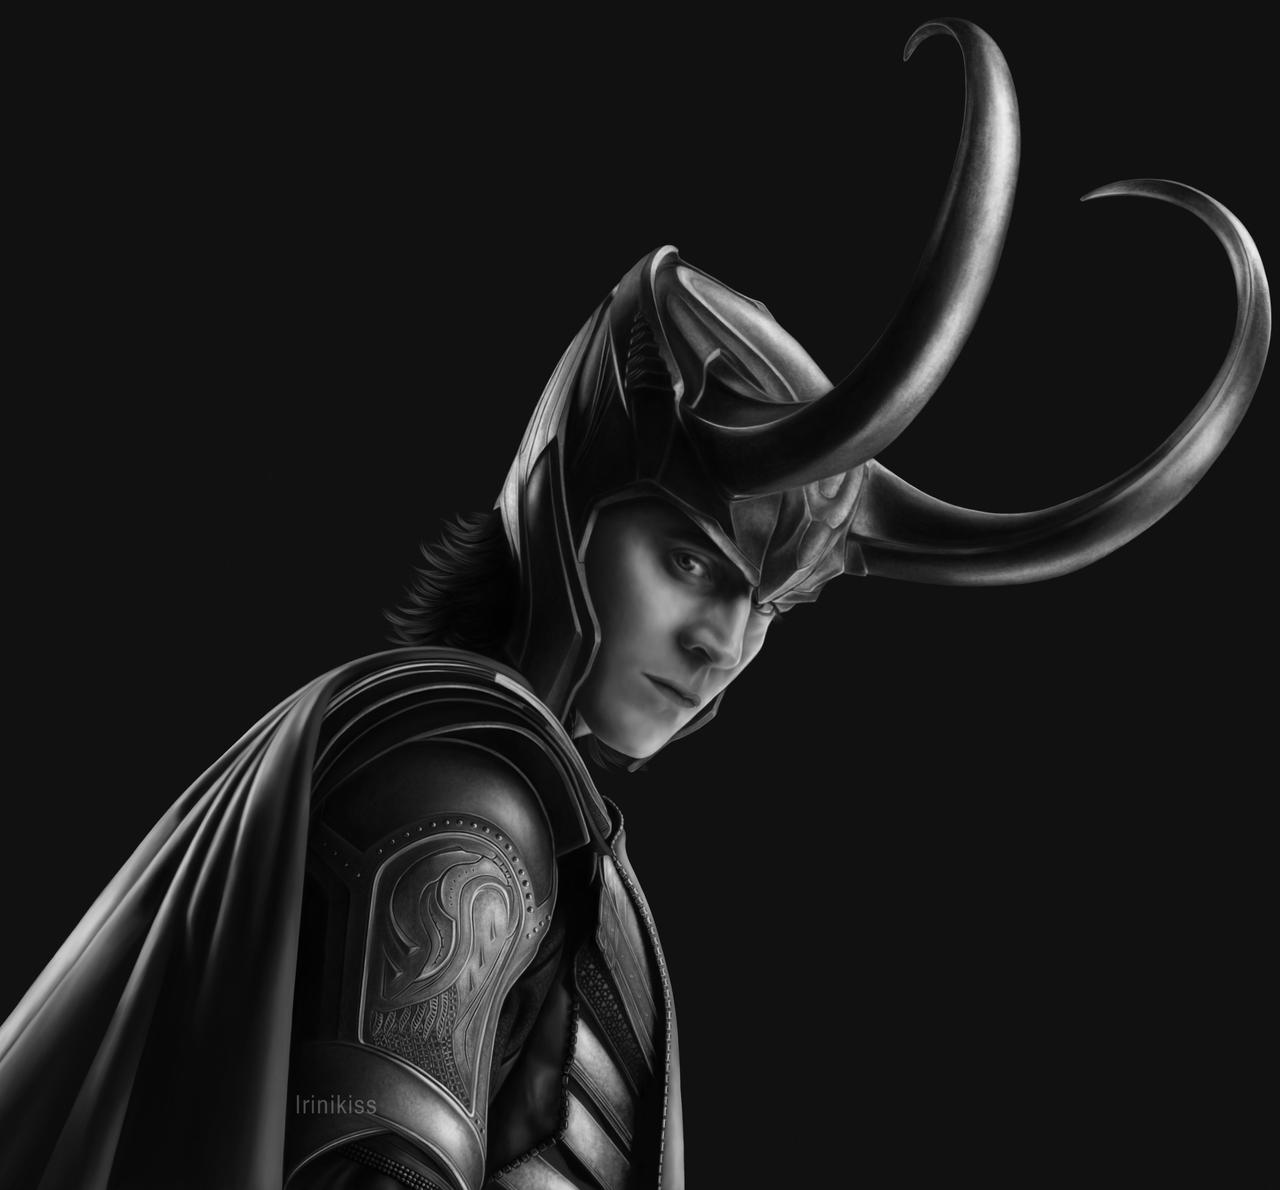 Loki by IriniKiss